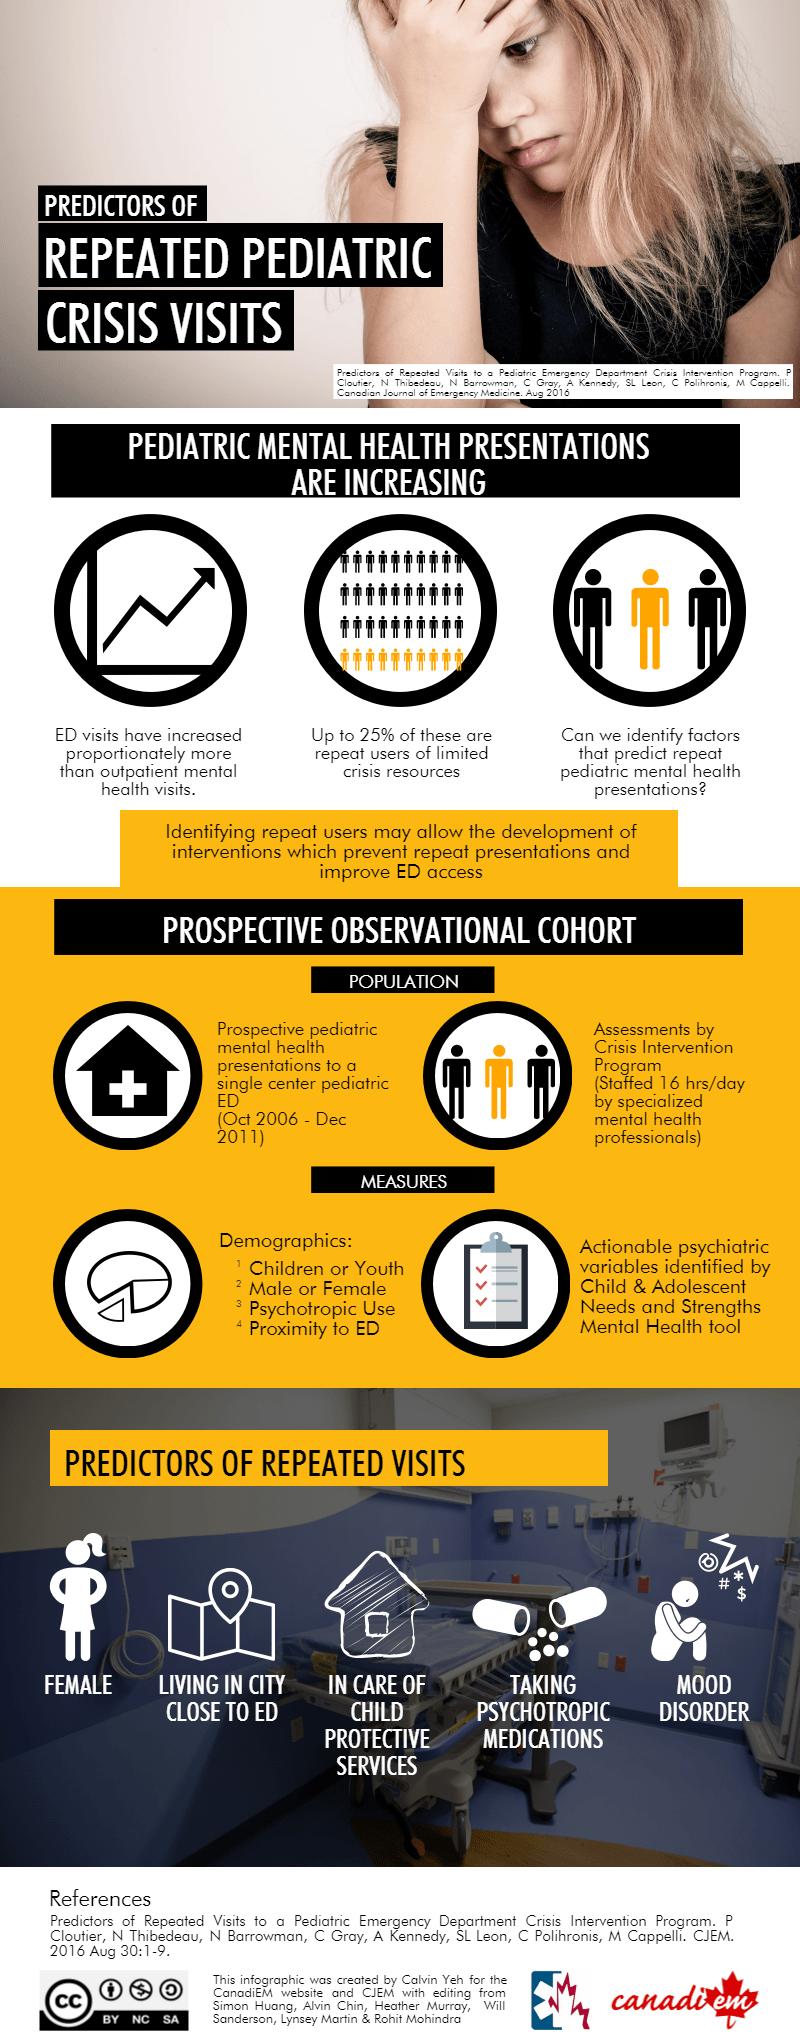 PEM Crisis Intervention Program